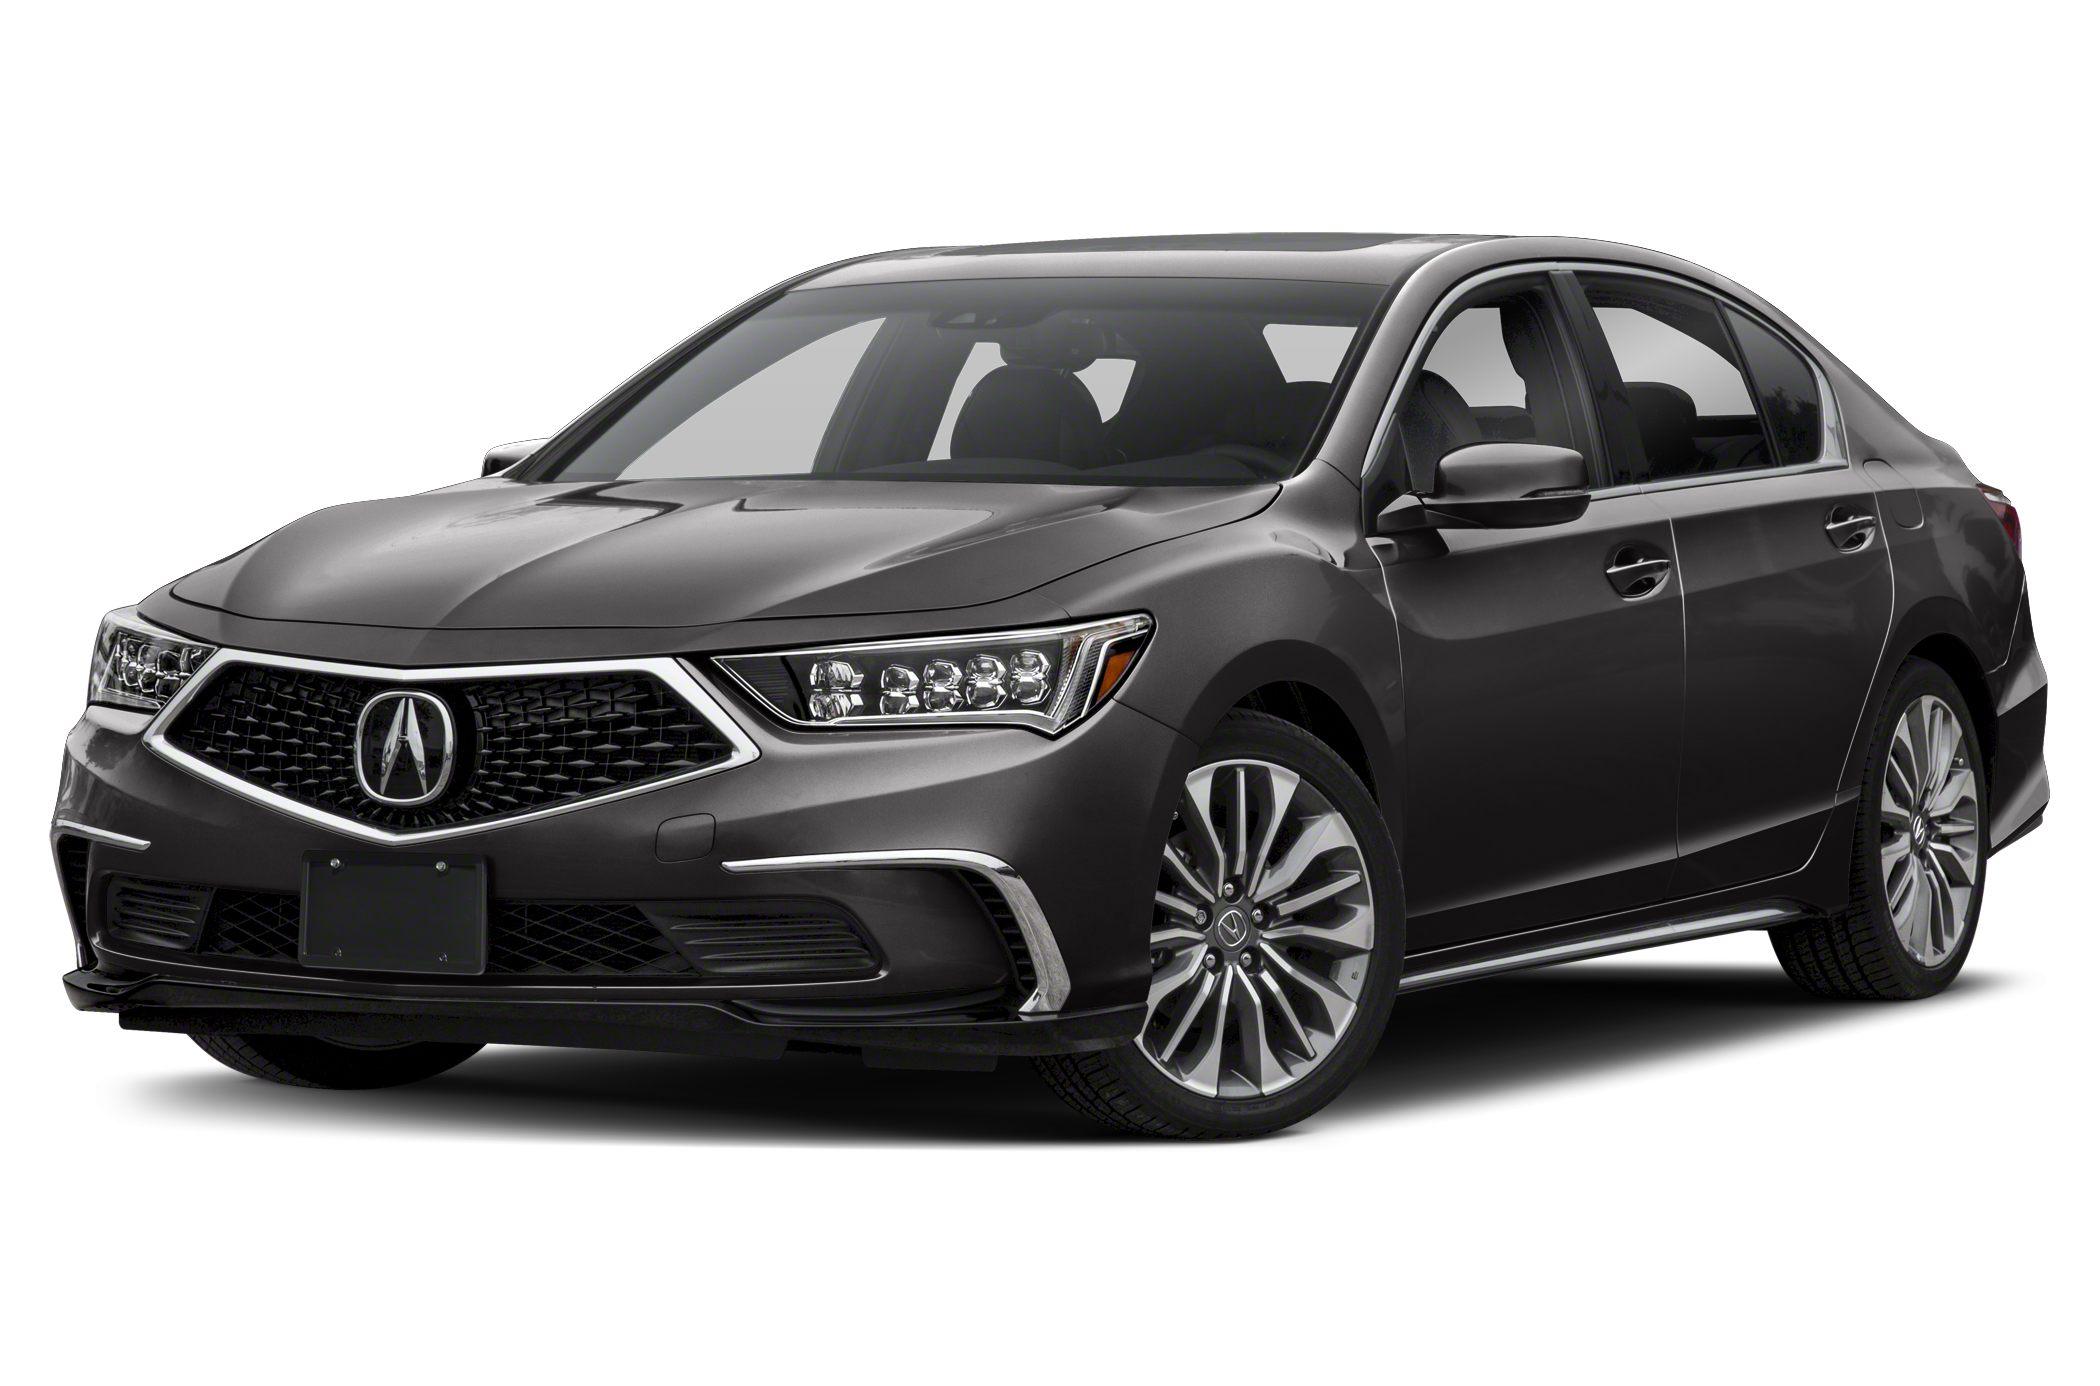 Honda slaps Legend name on JDM Acura RLX - Autoblog